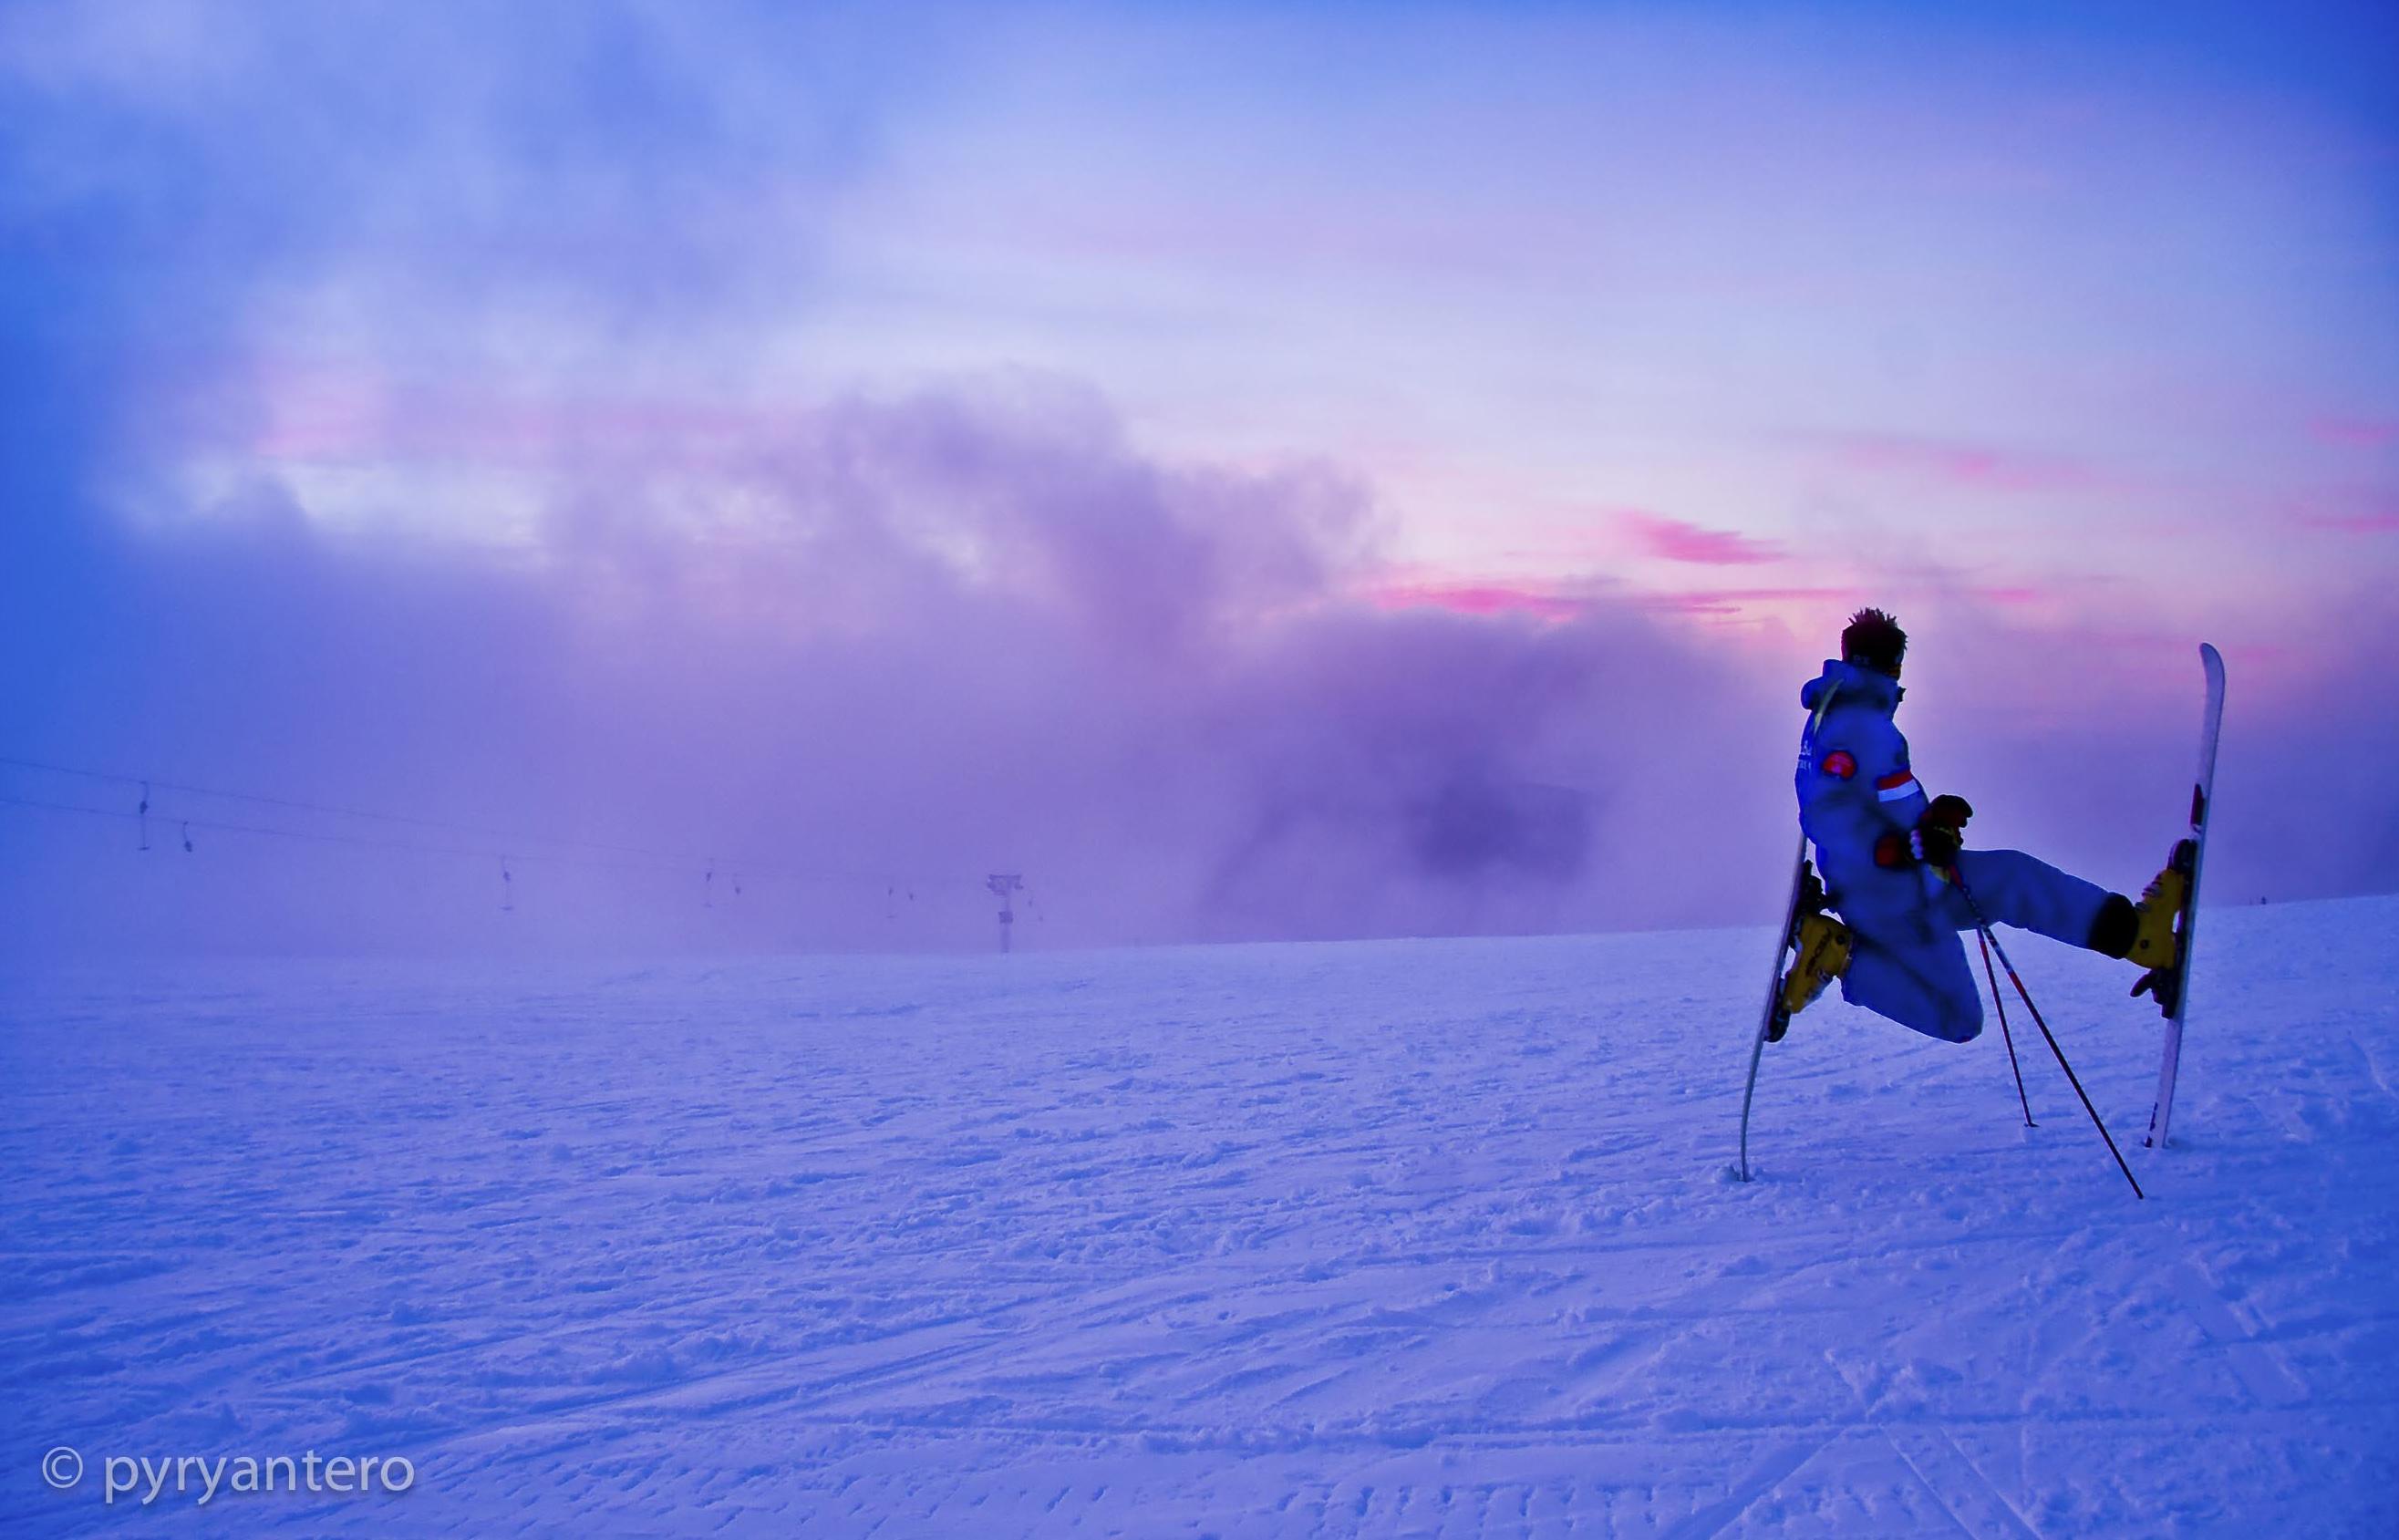 Mount Buller Australia  City pictures : Ski instructor in Mt Buller, Victoria, Australia. Mount Buller. Pyry ...